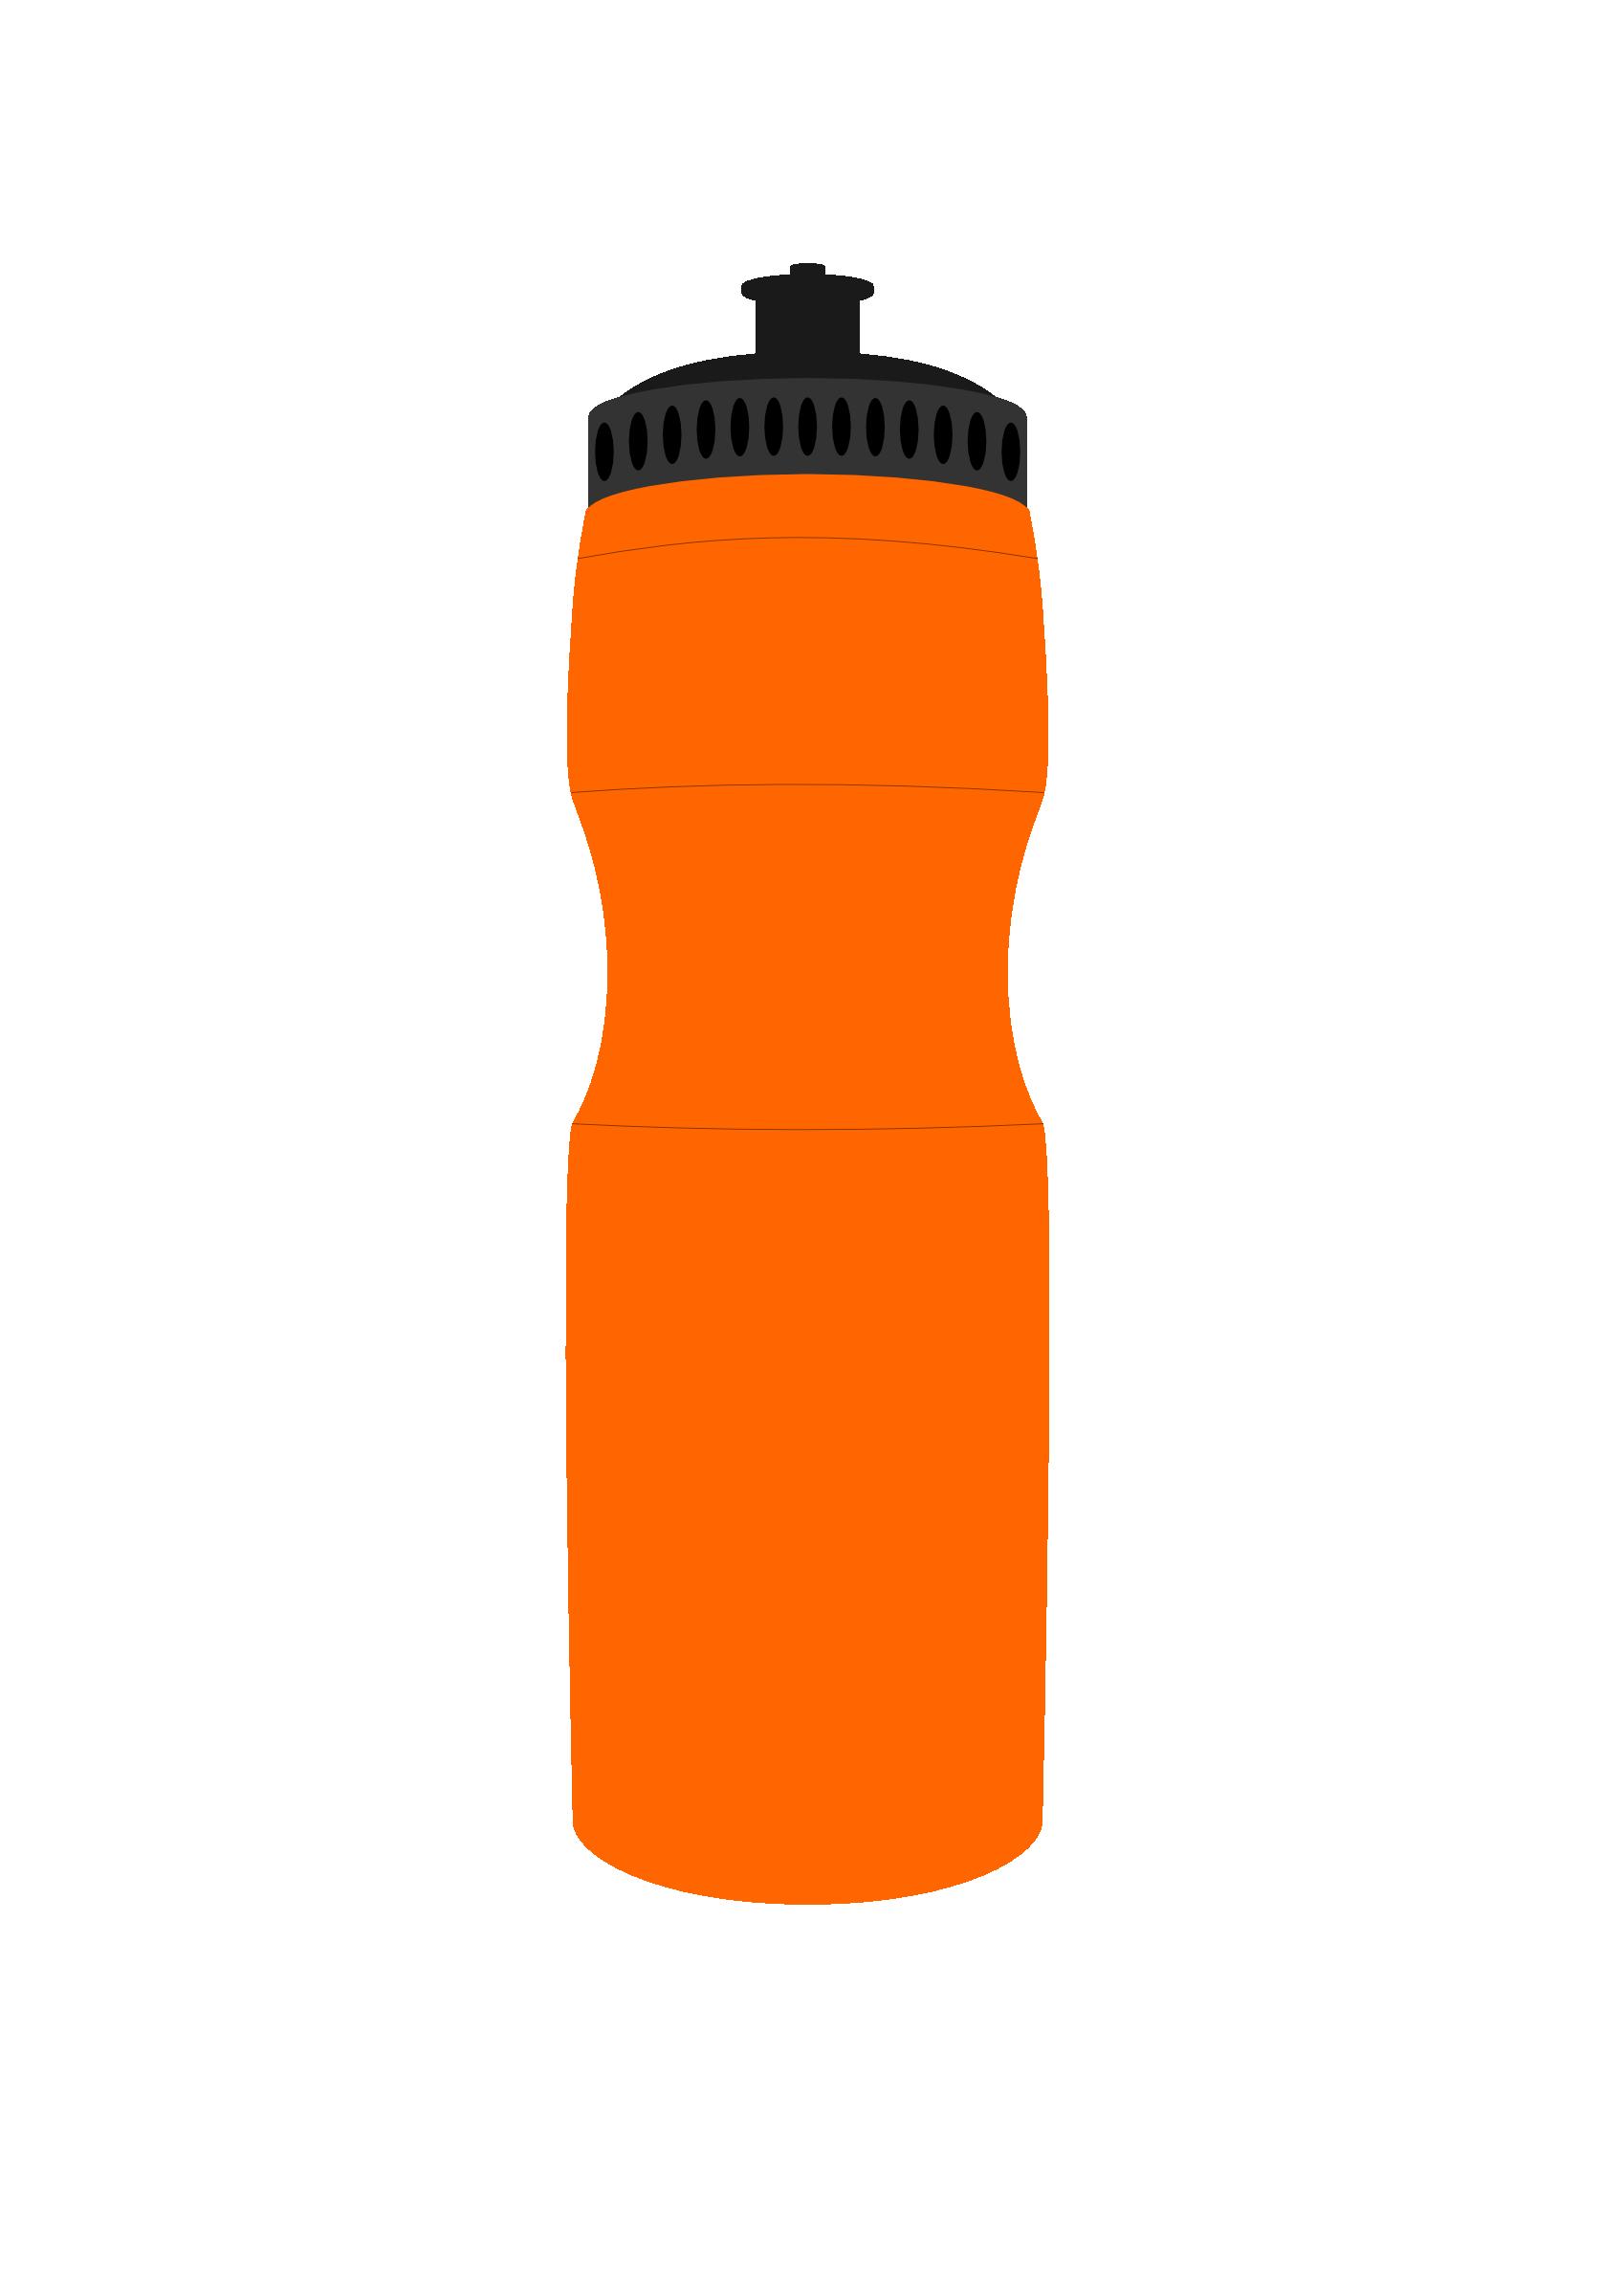 Water Bottle Clipart-water bottle clipart-5